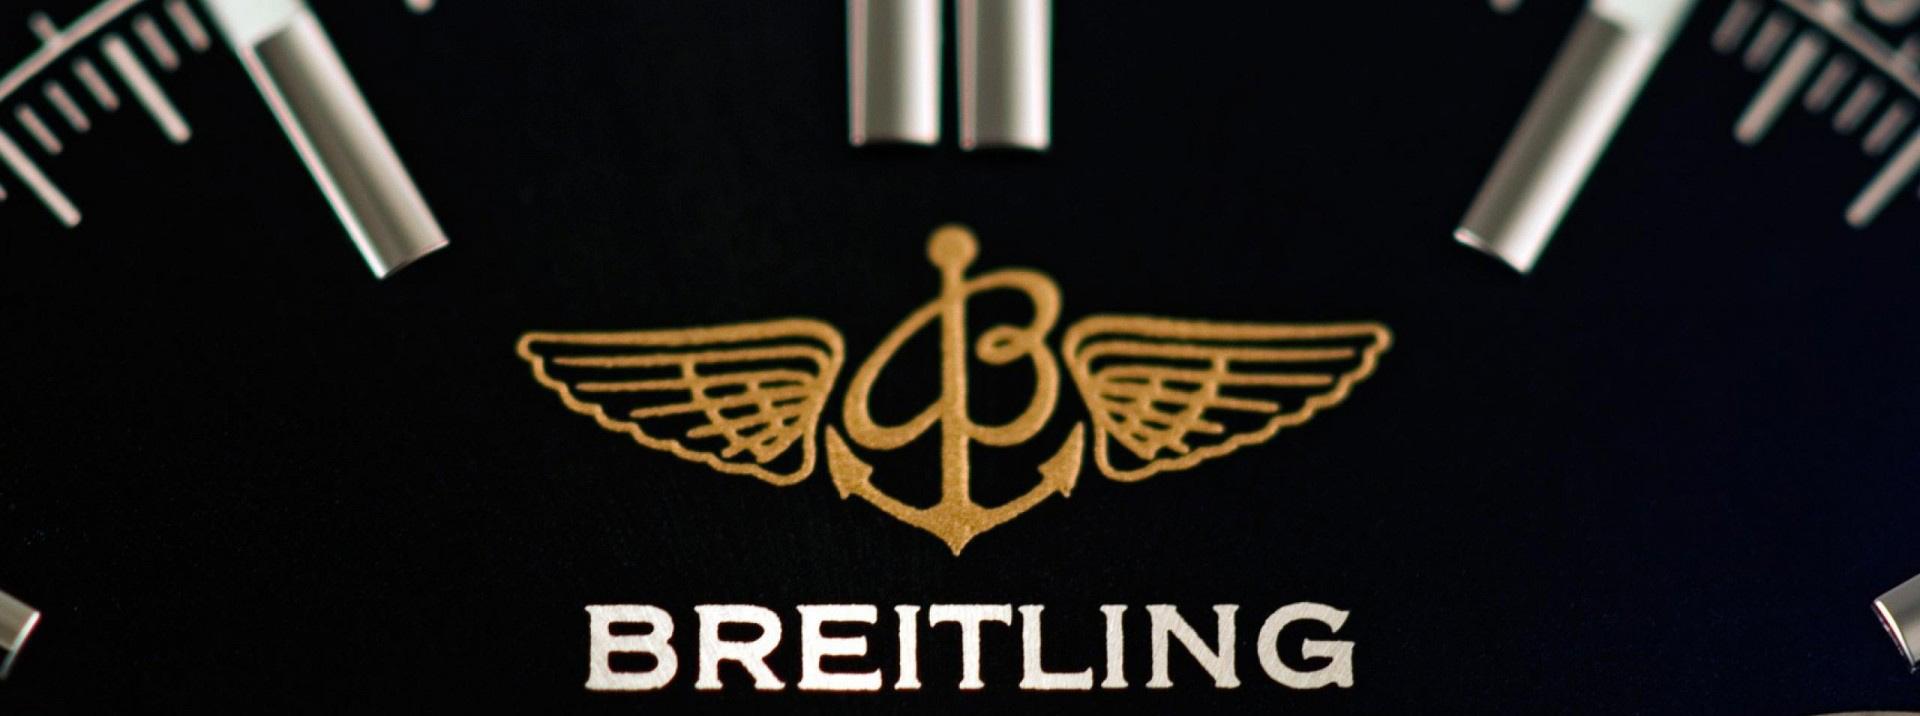 100 Bentley Mulliner Tourbillon Breitling Watch